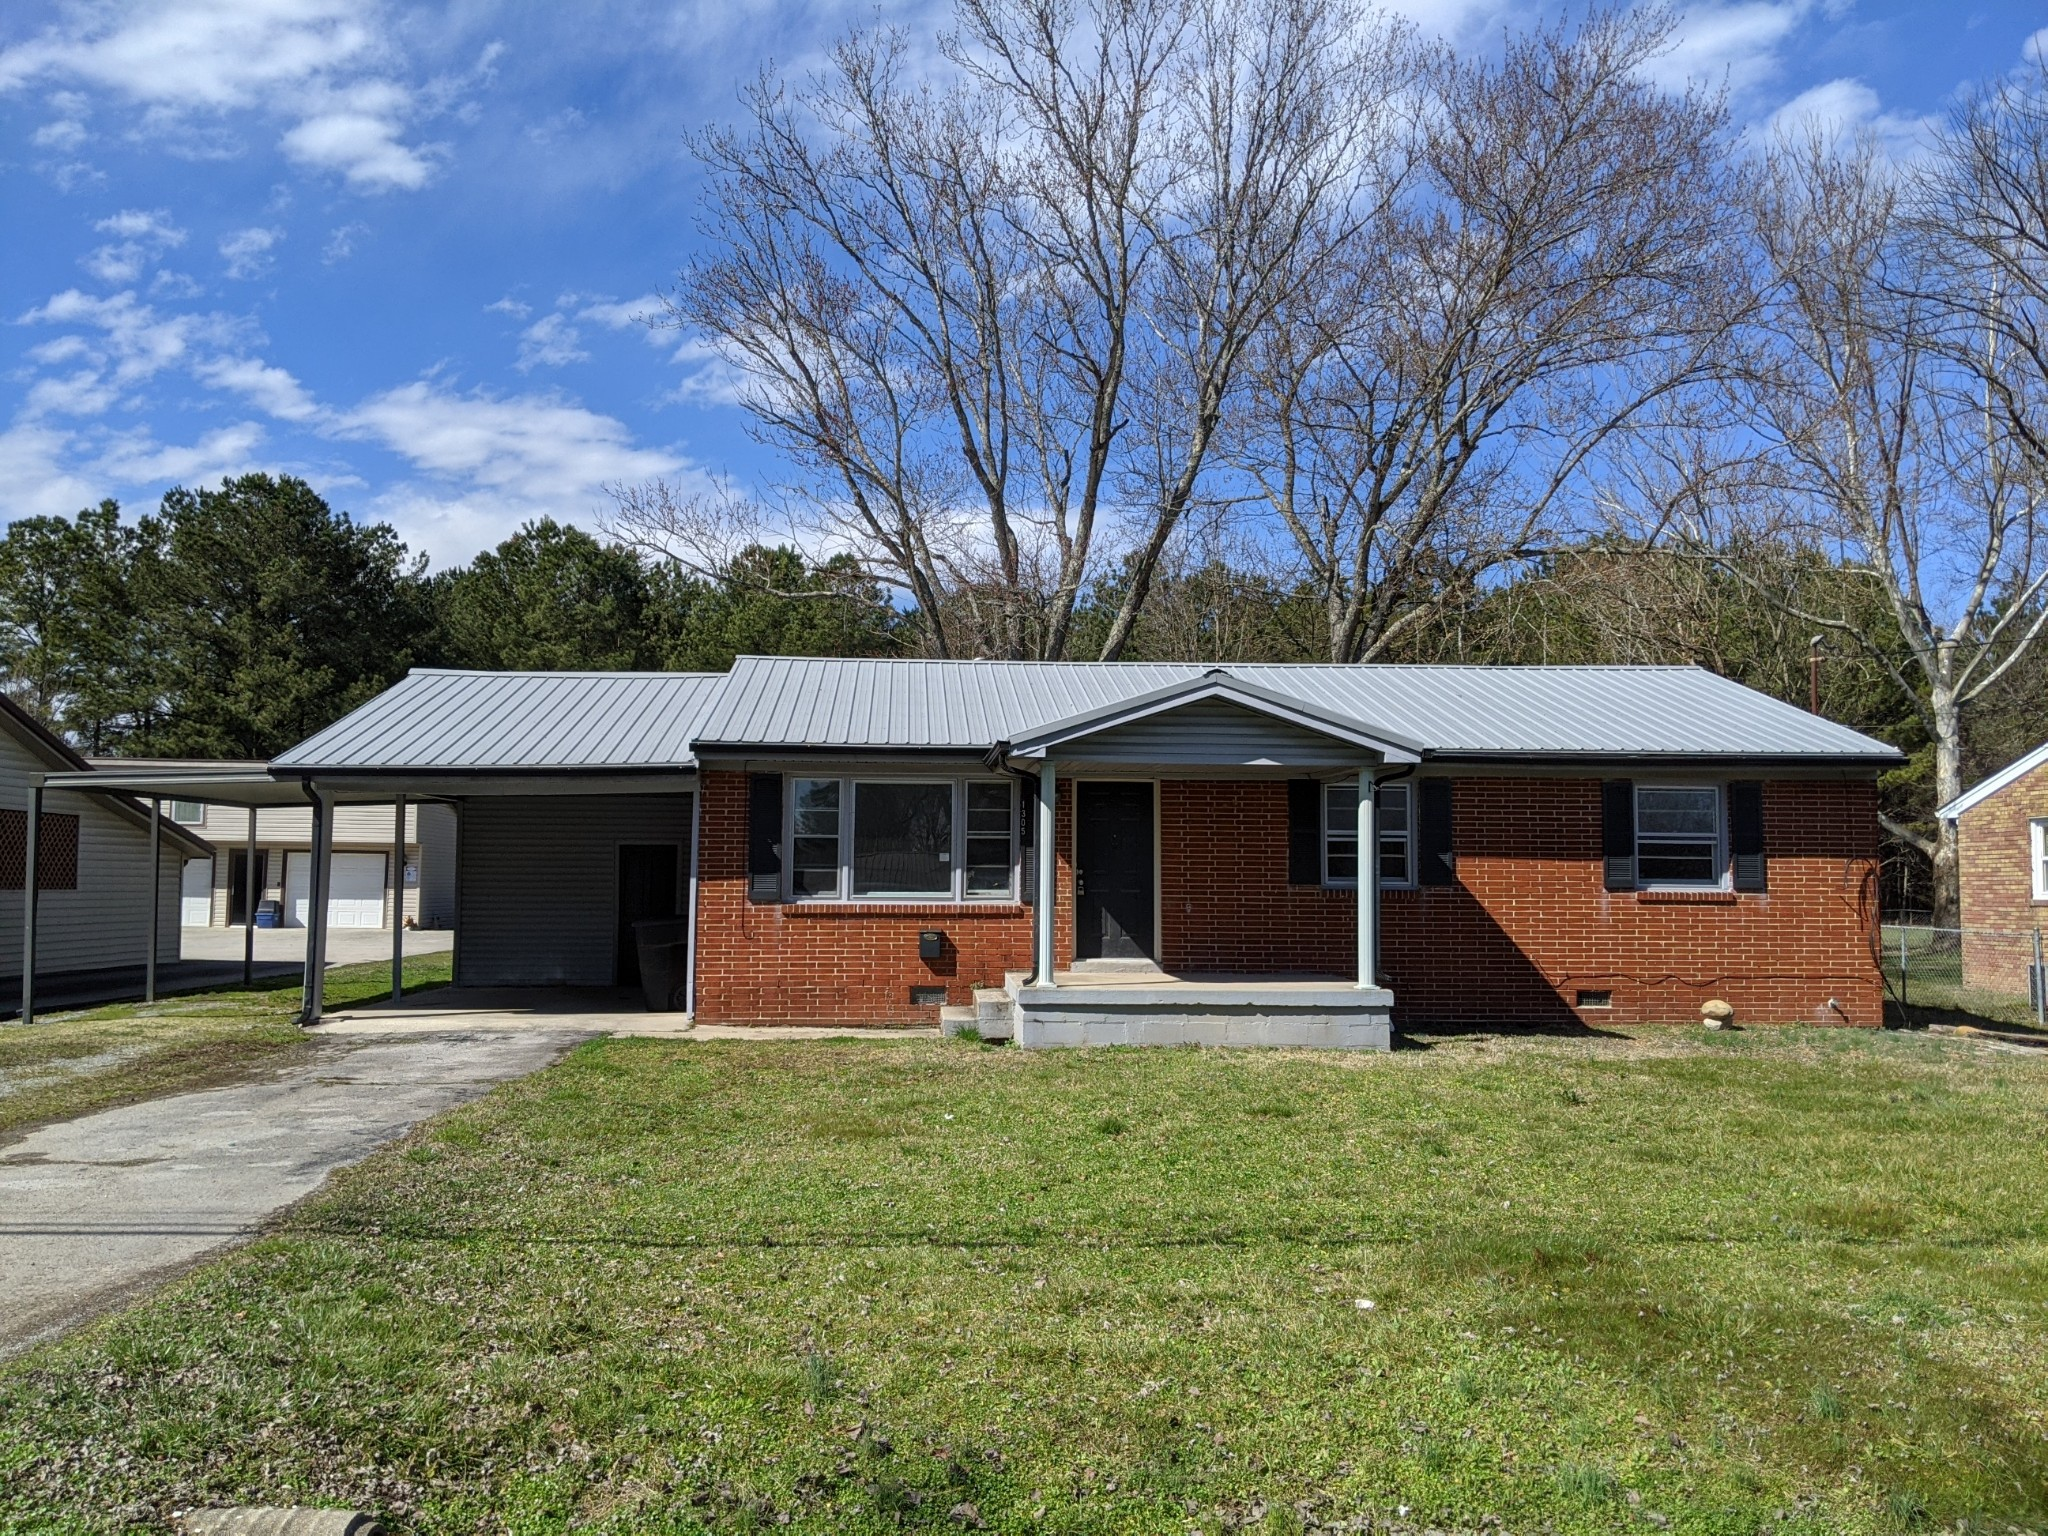 1305 E Grundy St Property Photo - Tullahoma, TN real estate listing